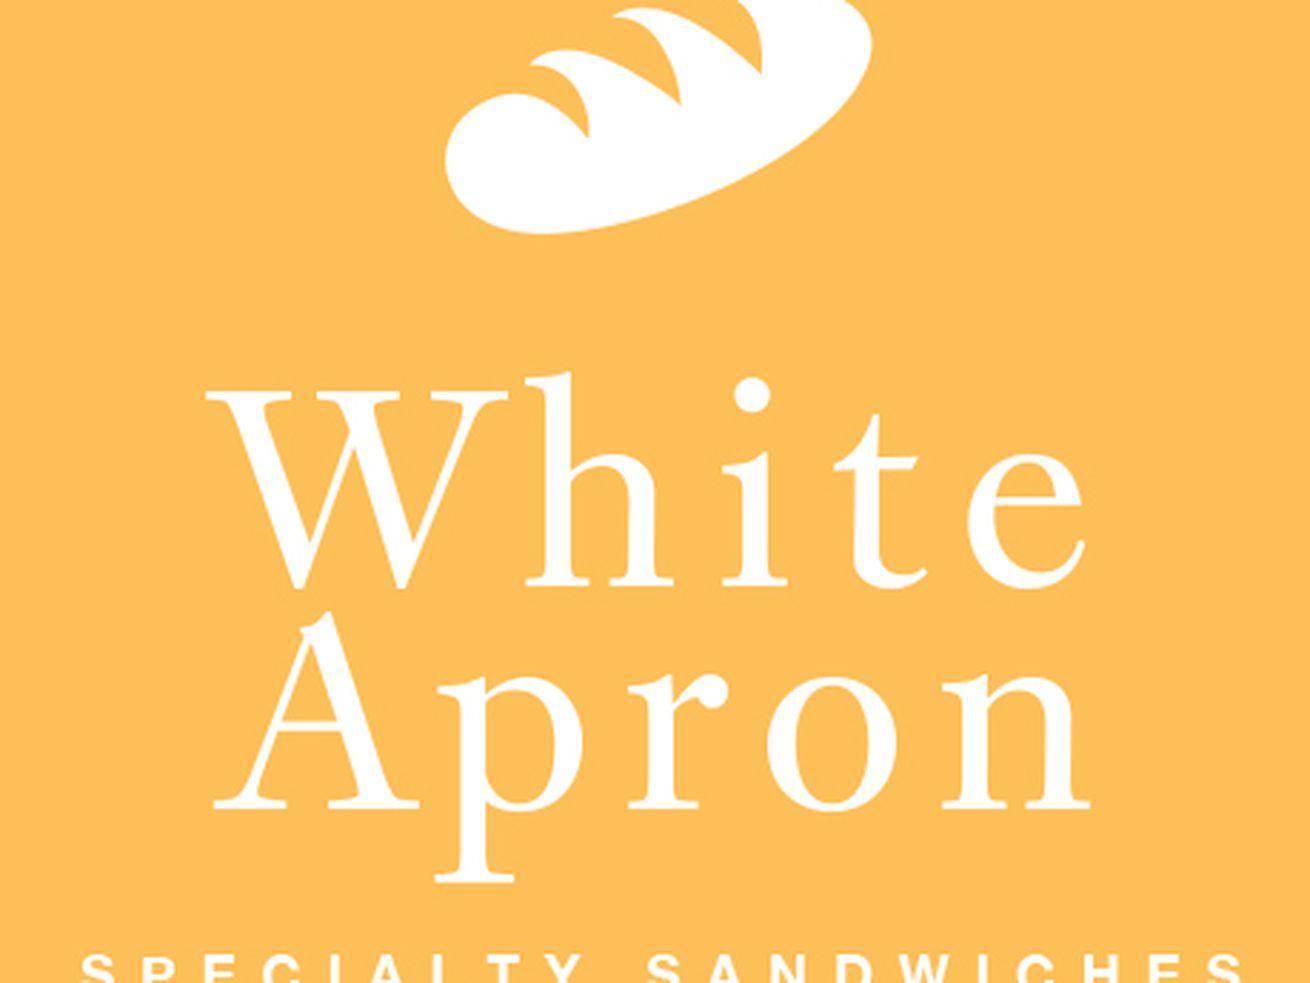 White apron penn quarter - White Apron Penn Quarter 5